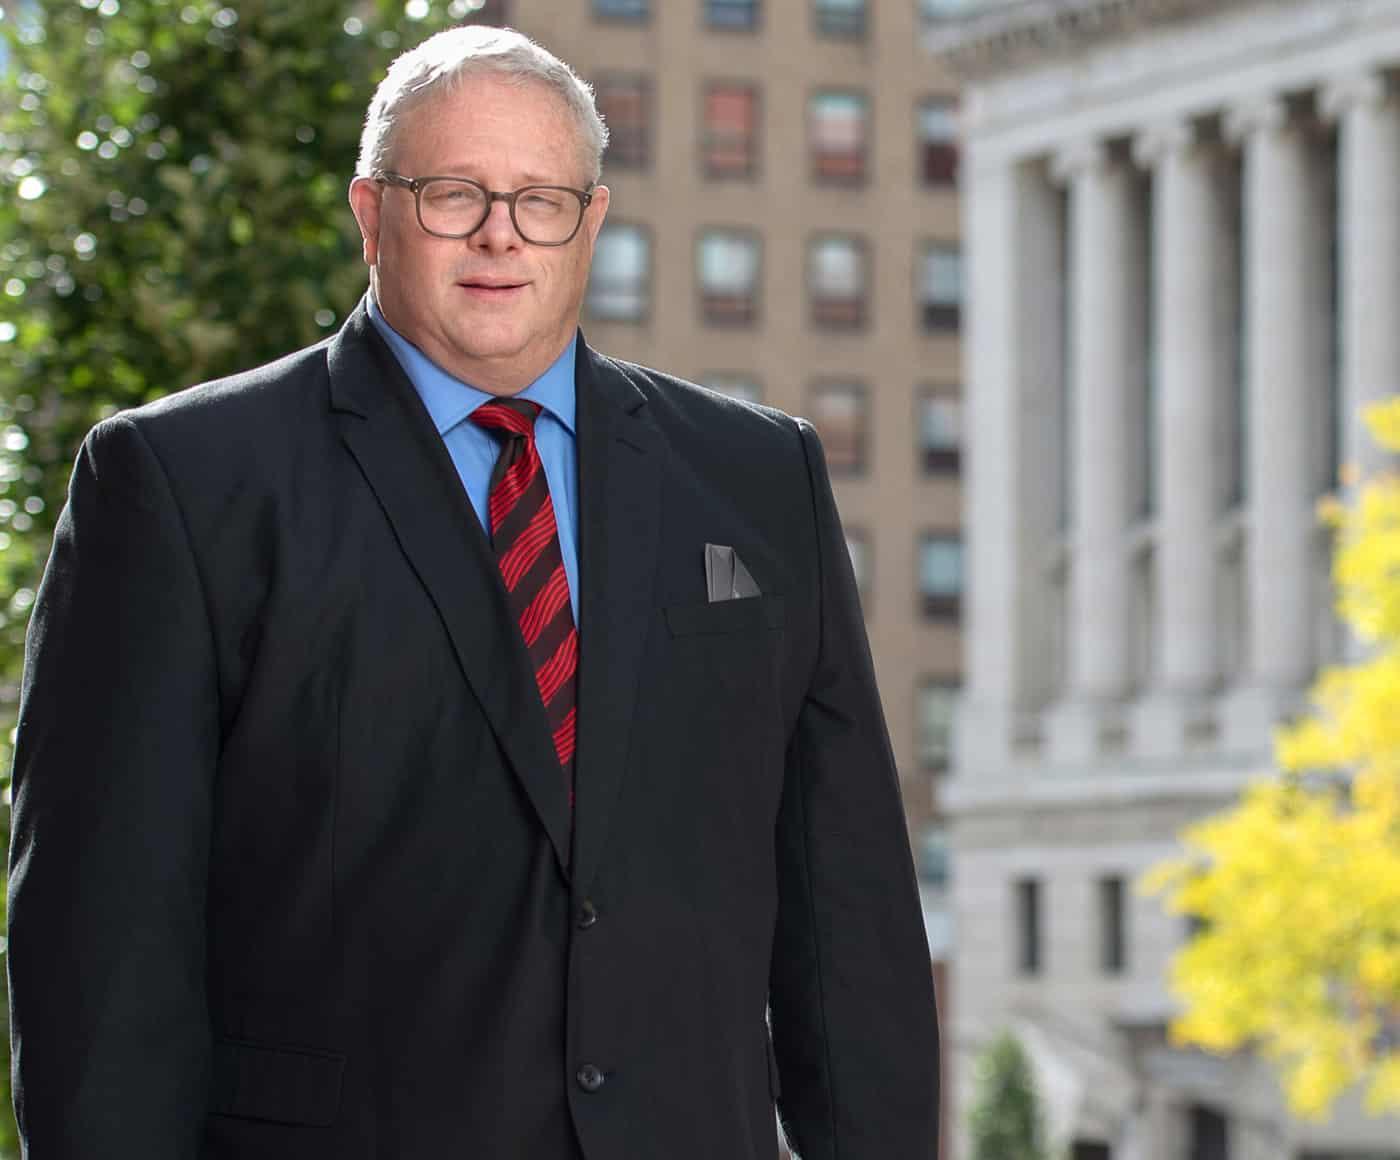 Dennis W. Habel